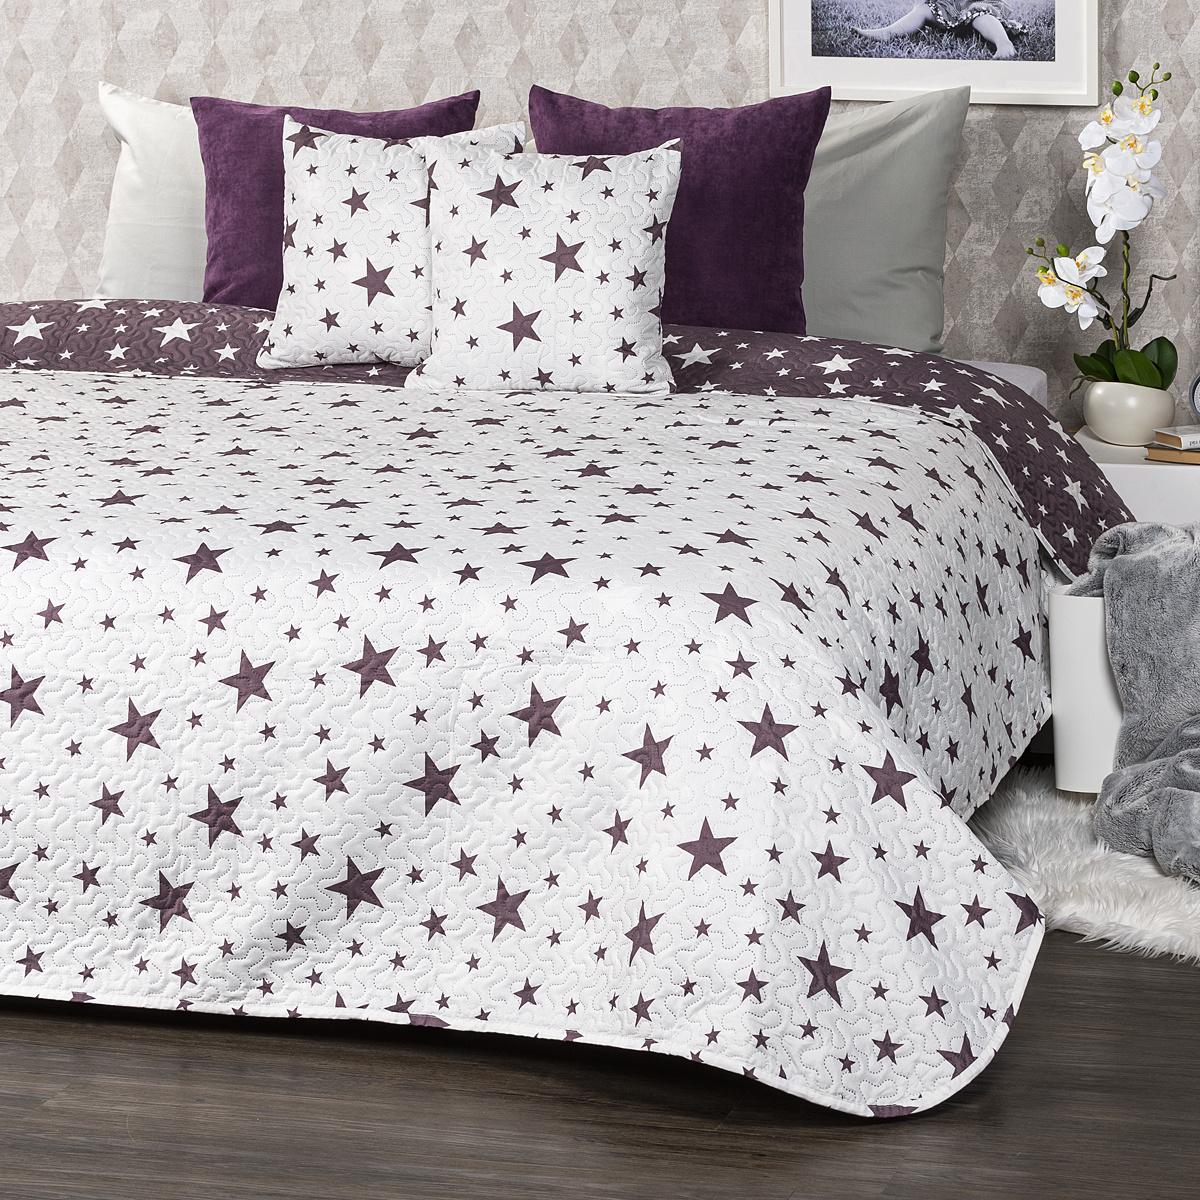 4Home Narzuta na łóżko Stars, 220 x 240 cm, 2 szt. 40 x 40 cm